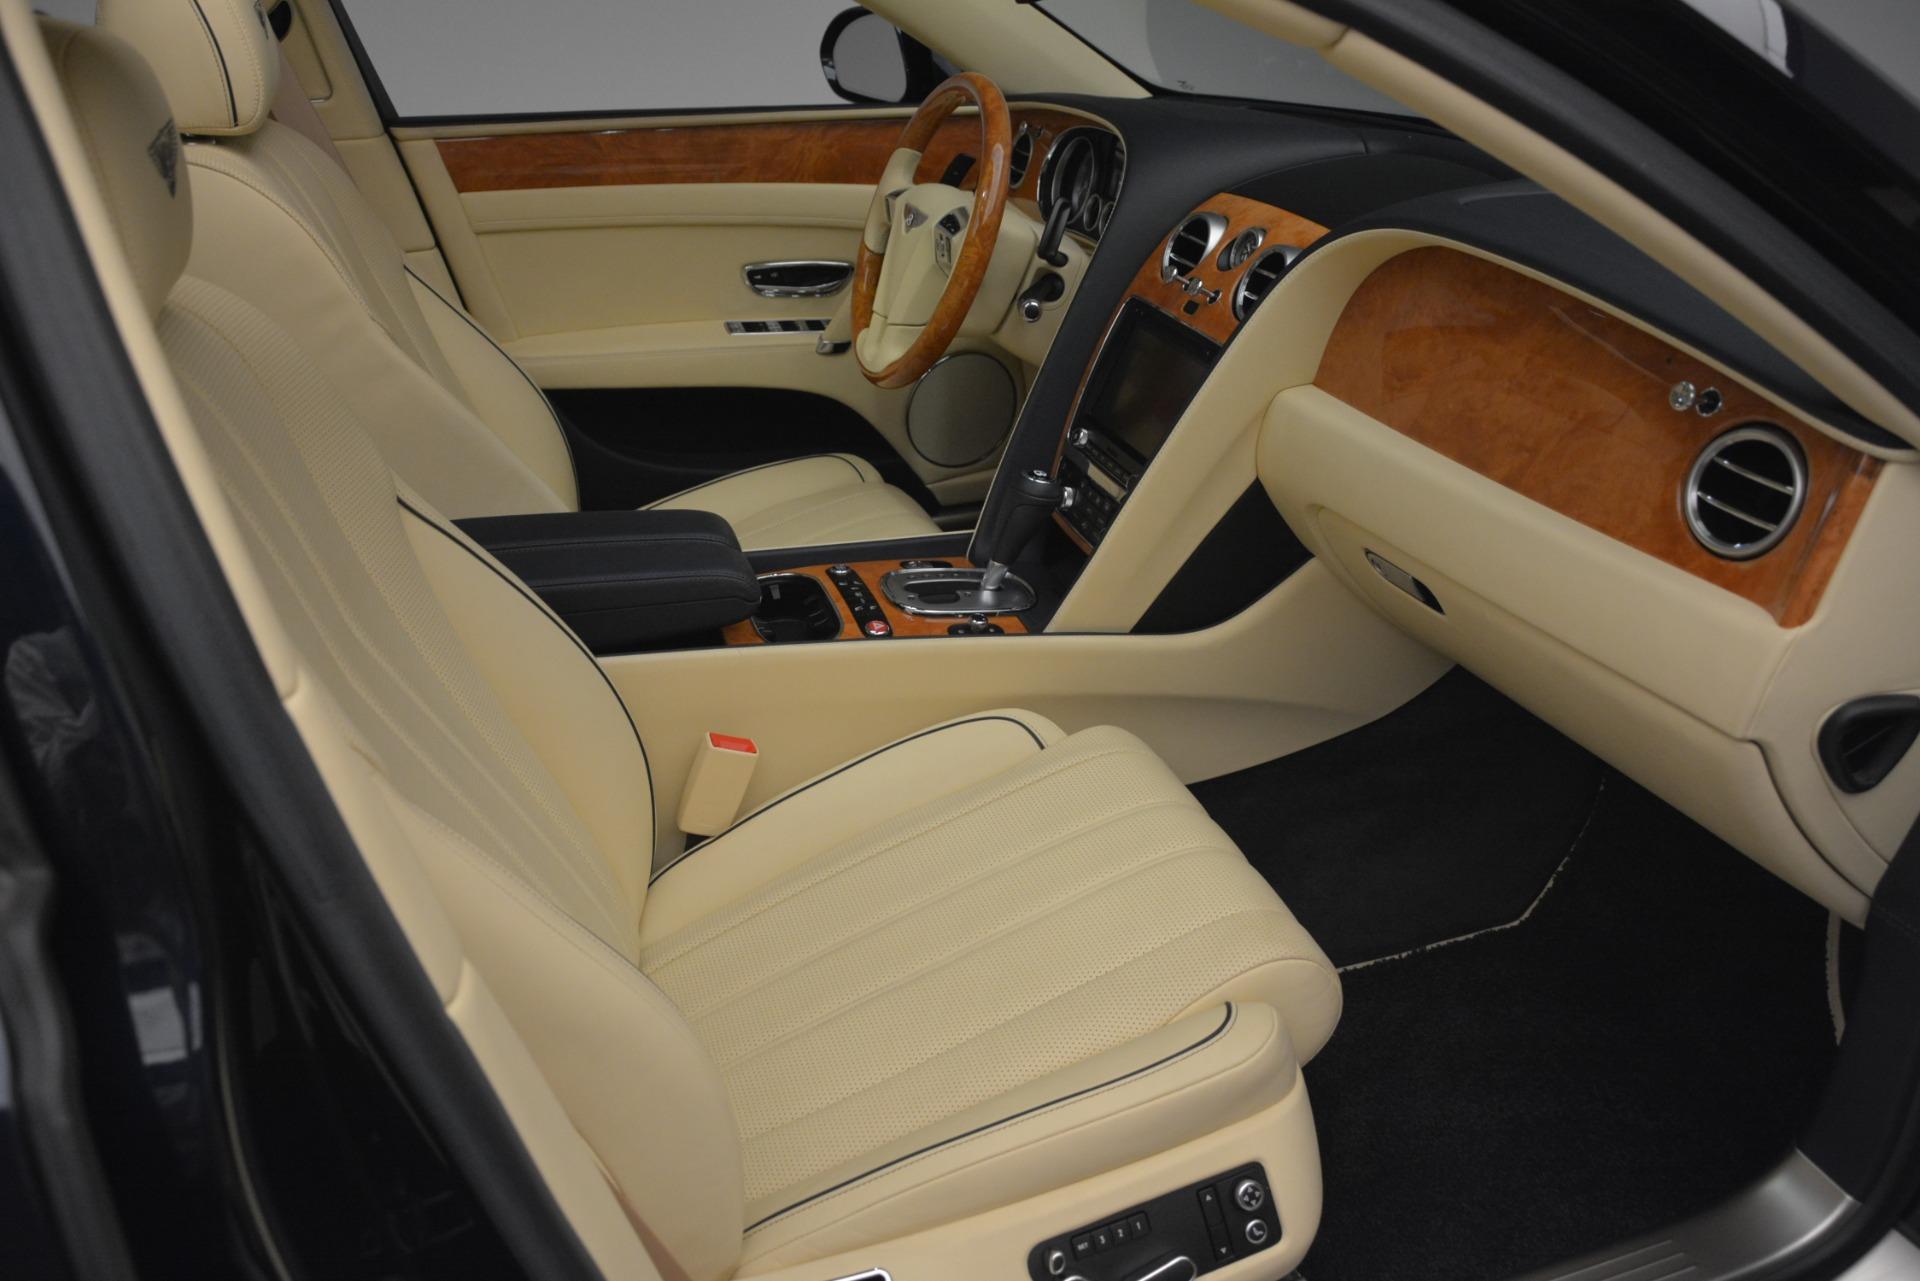 Used 2015 Bentley Flying Spur V8 For Sale In Westport, CT 2997_p29